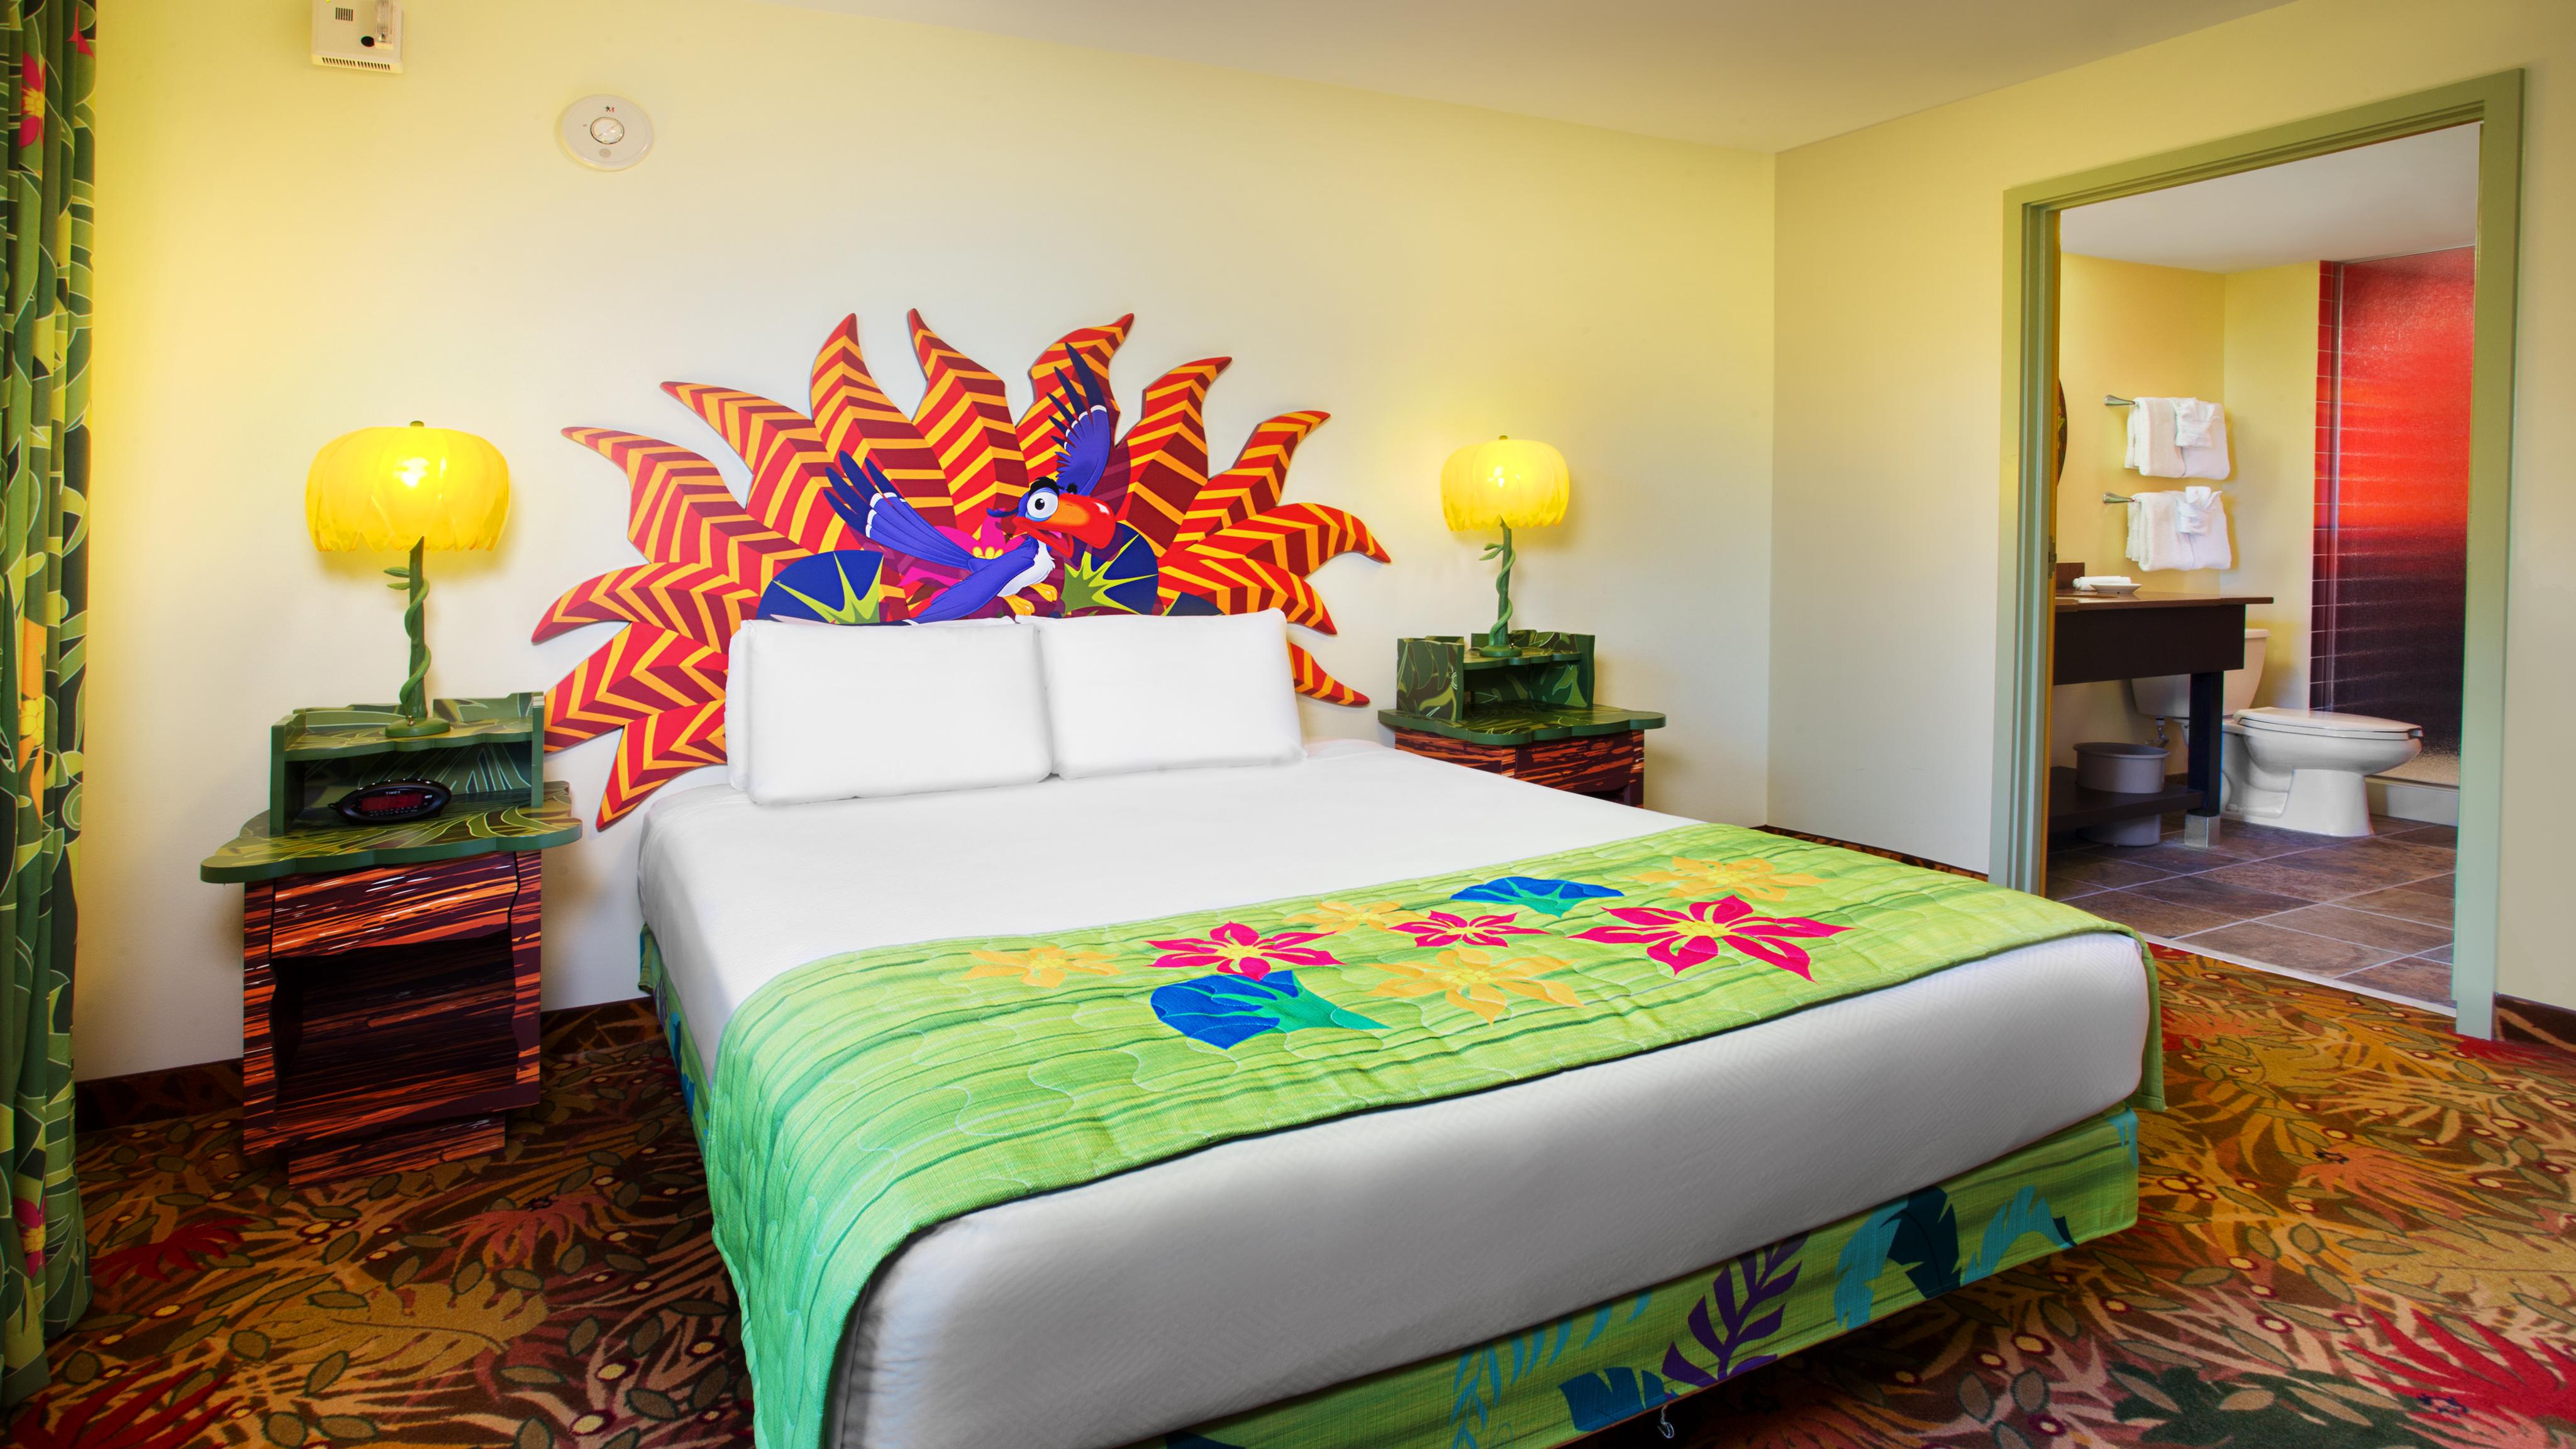 Lion King rooms at Disney's Art of Animation Resort